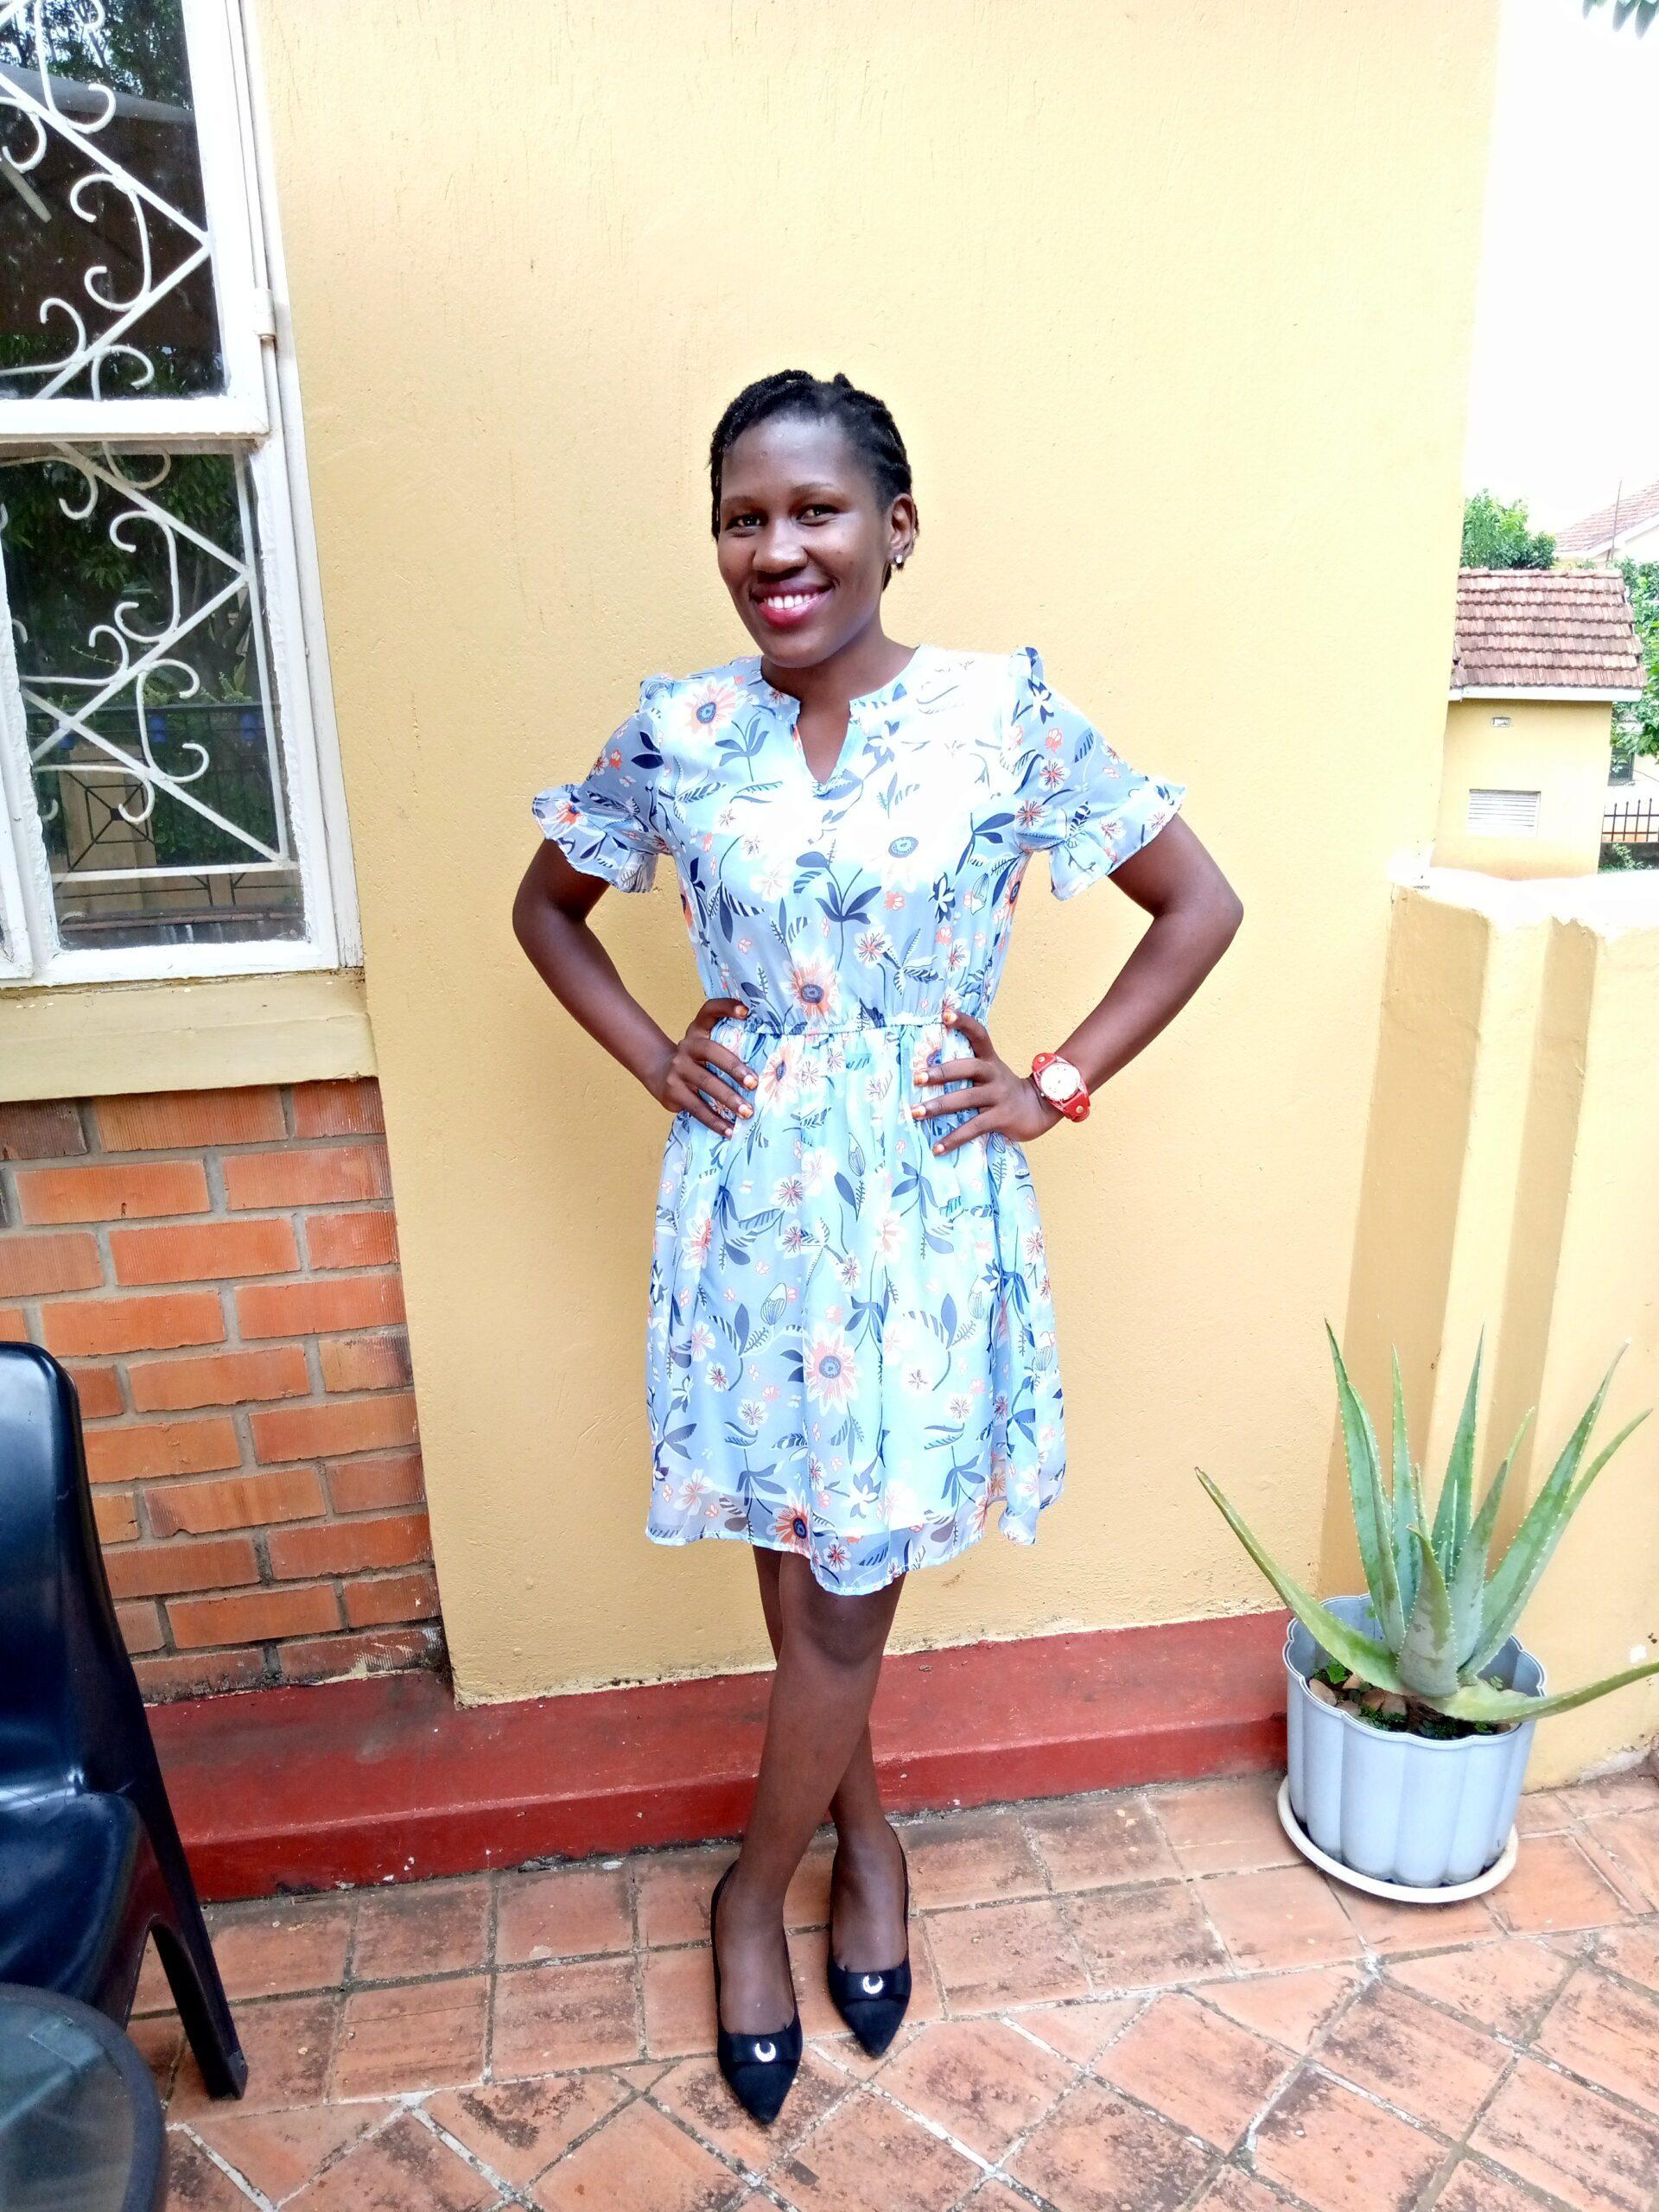 Brenda Mutalaza outdoors